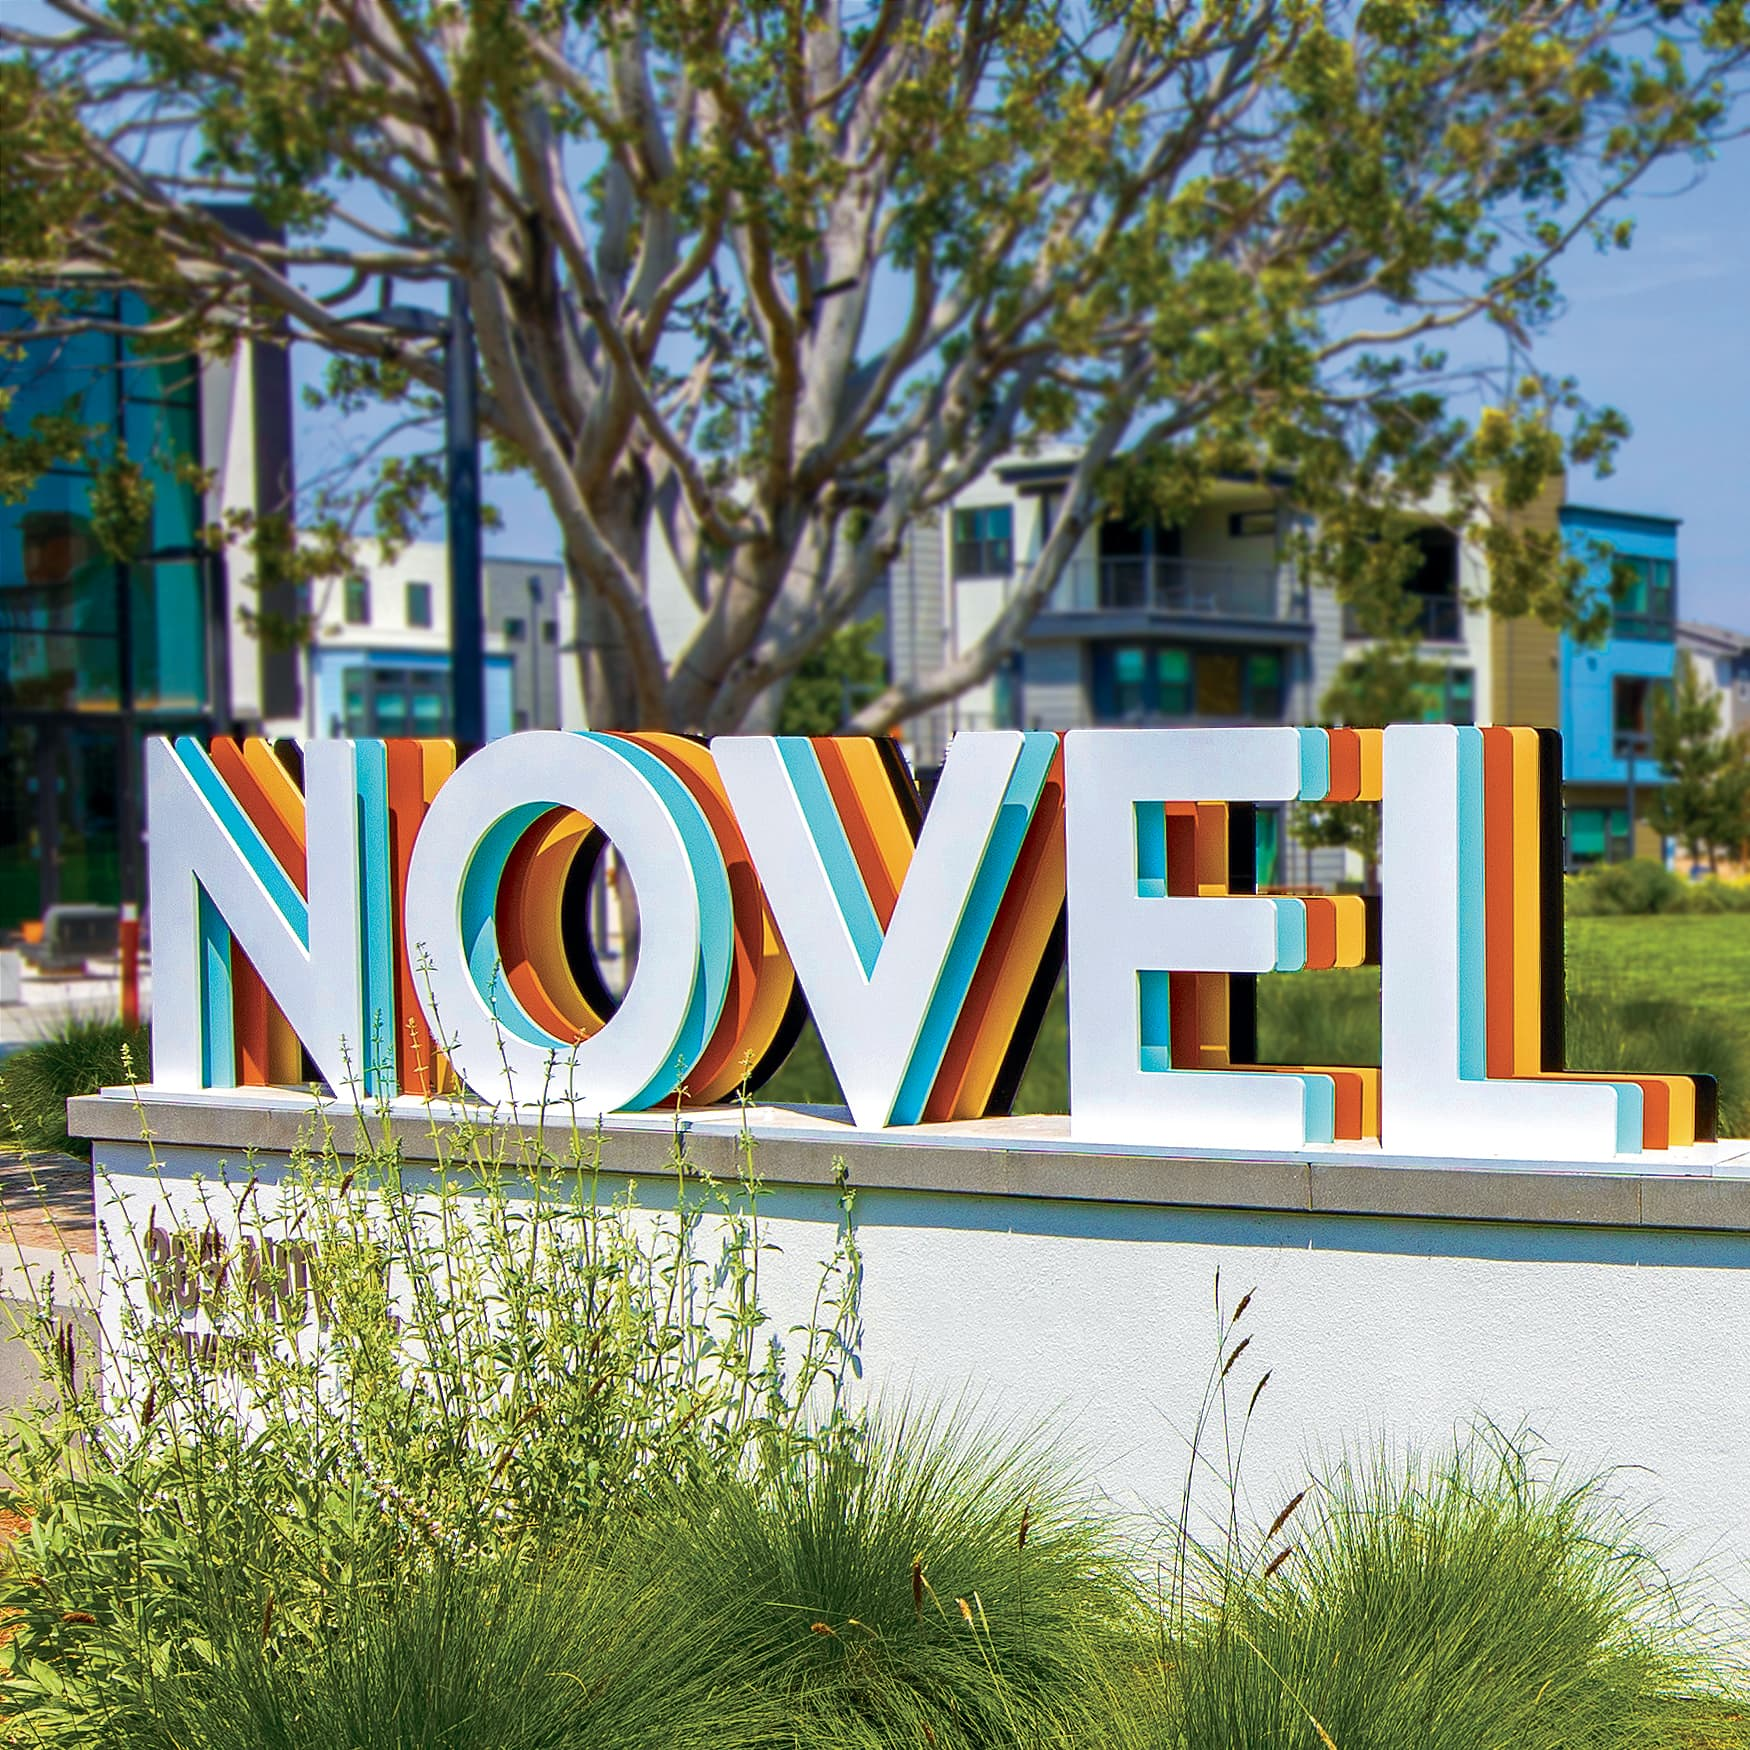 Multi-colored identity sign design at Novel Park in Irvine, California.